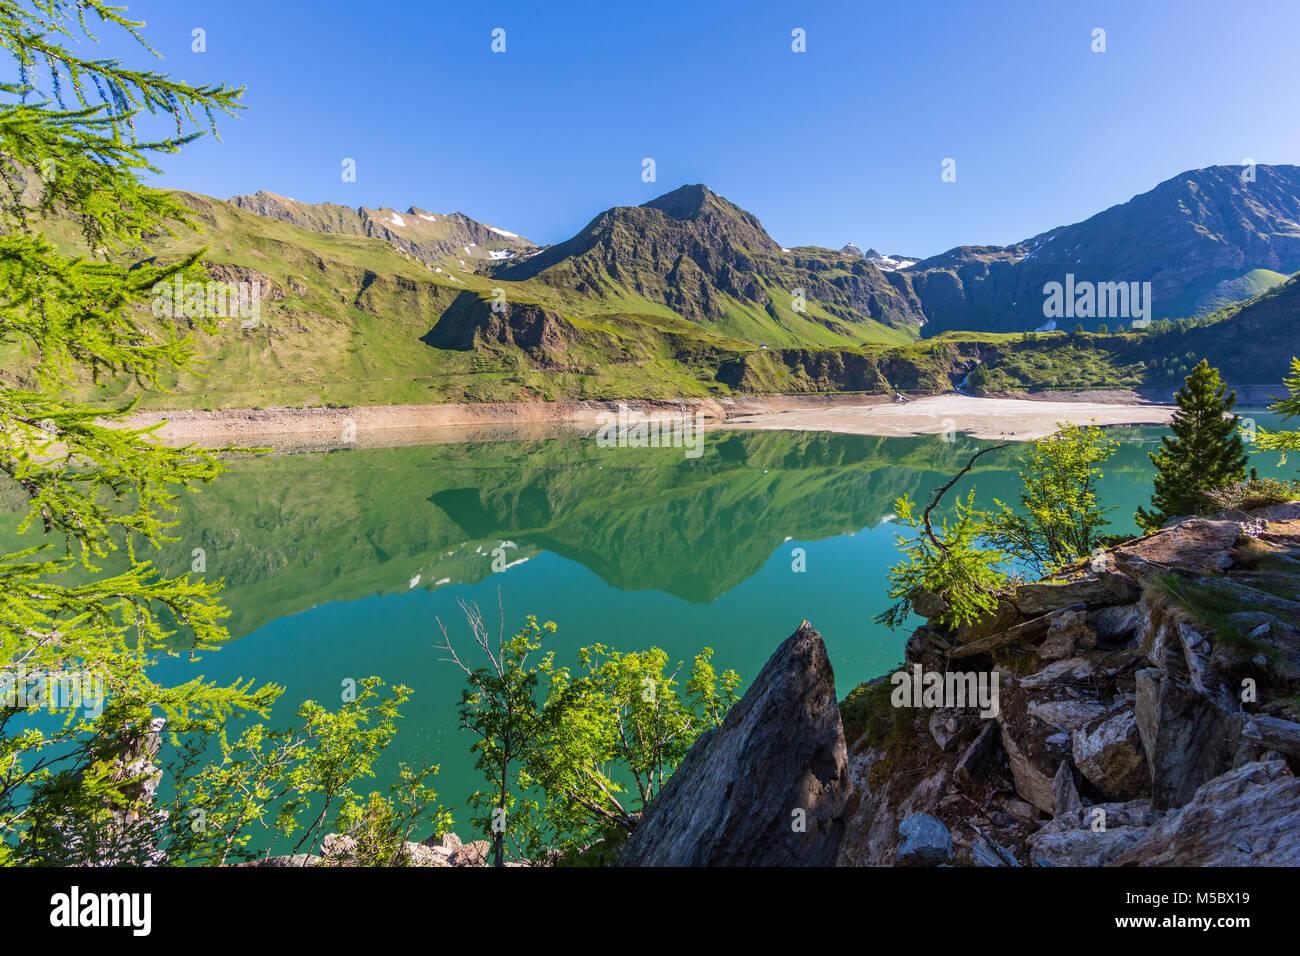 natural lake Ritom in canton ticino Piora valley Stock Photo